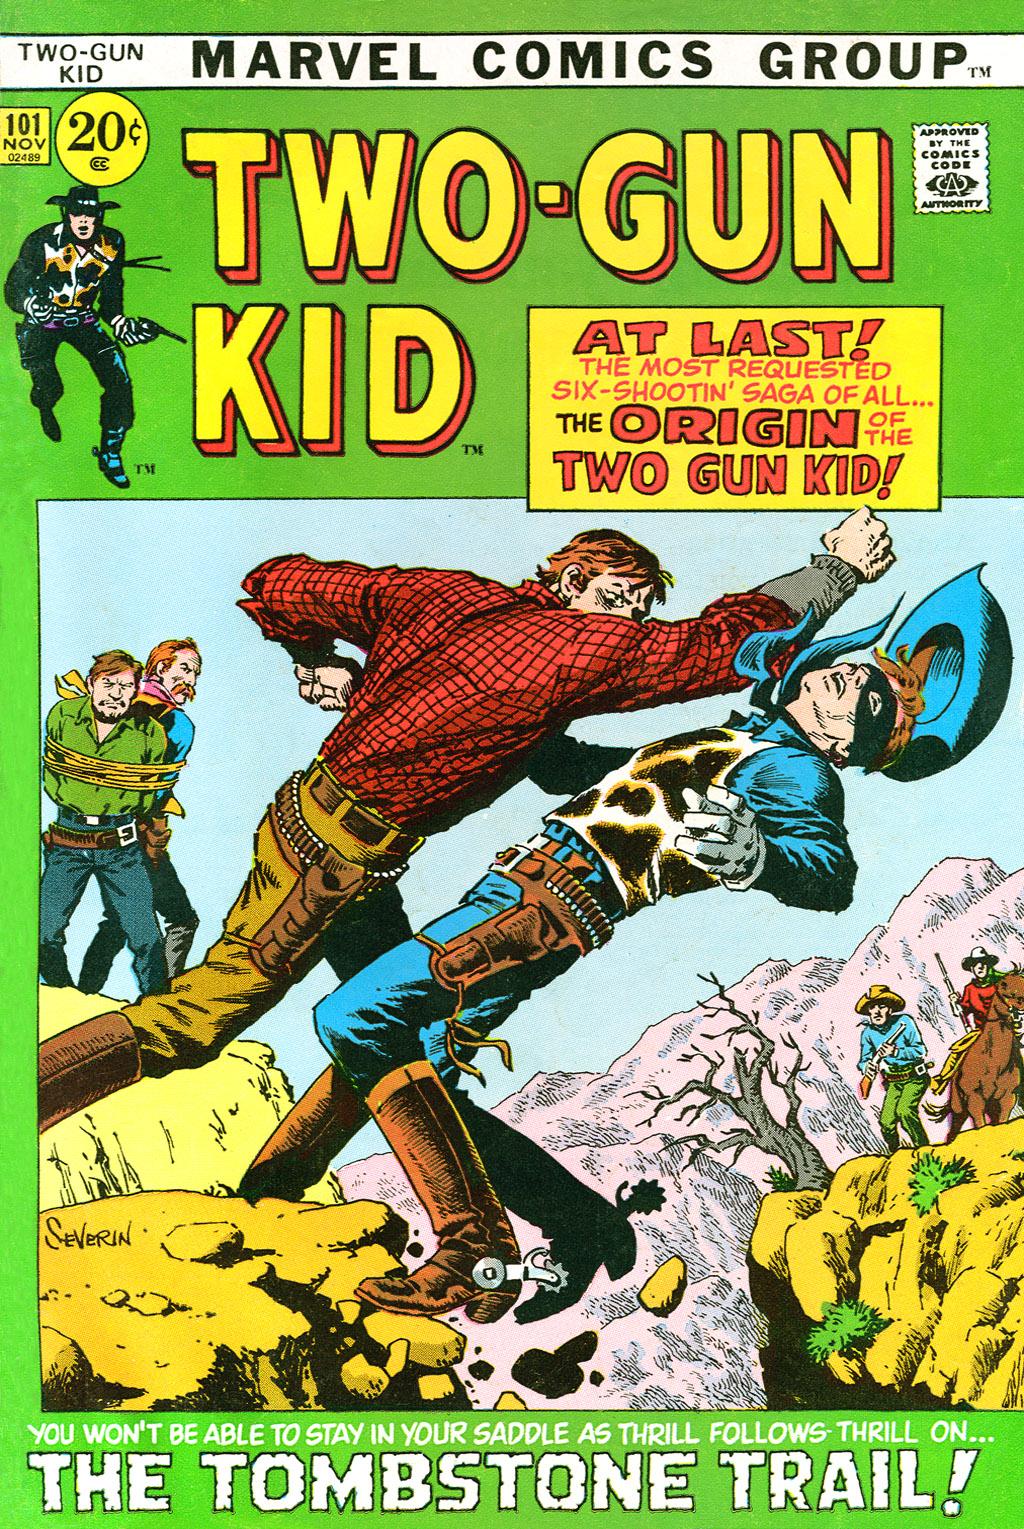 Read online Two-Gun Kid comic -  Issue #101 - 1